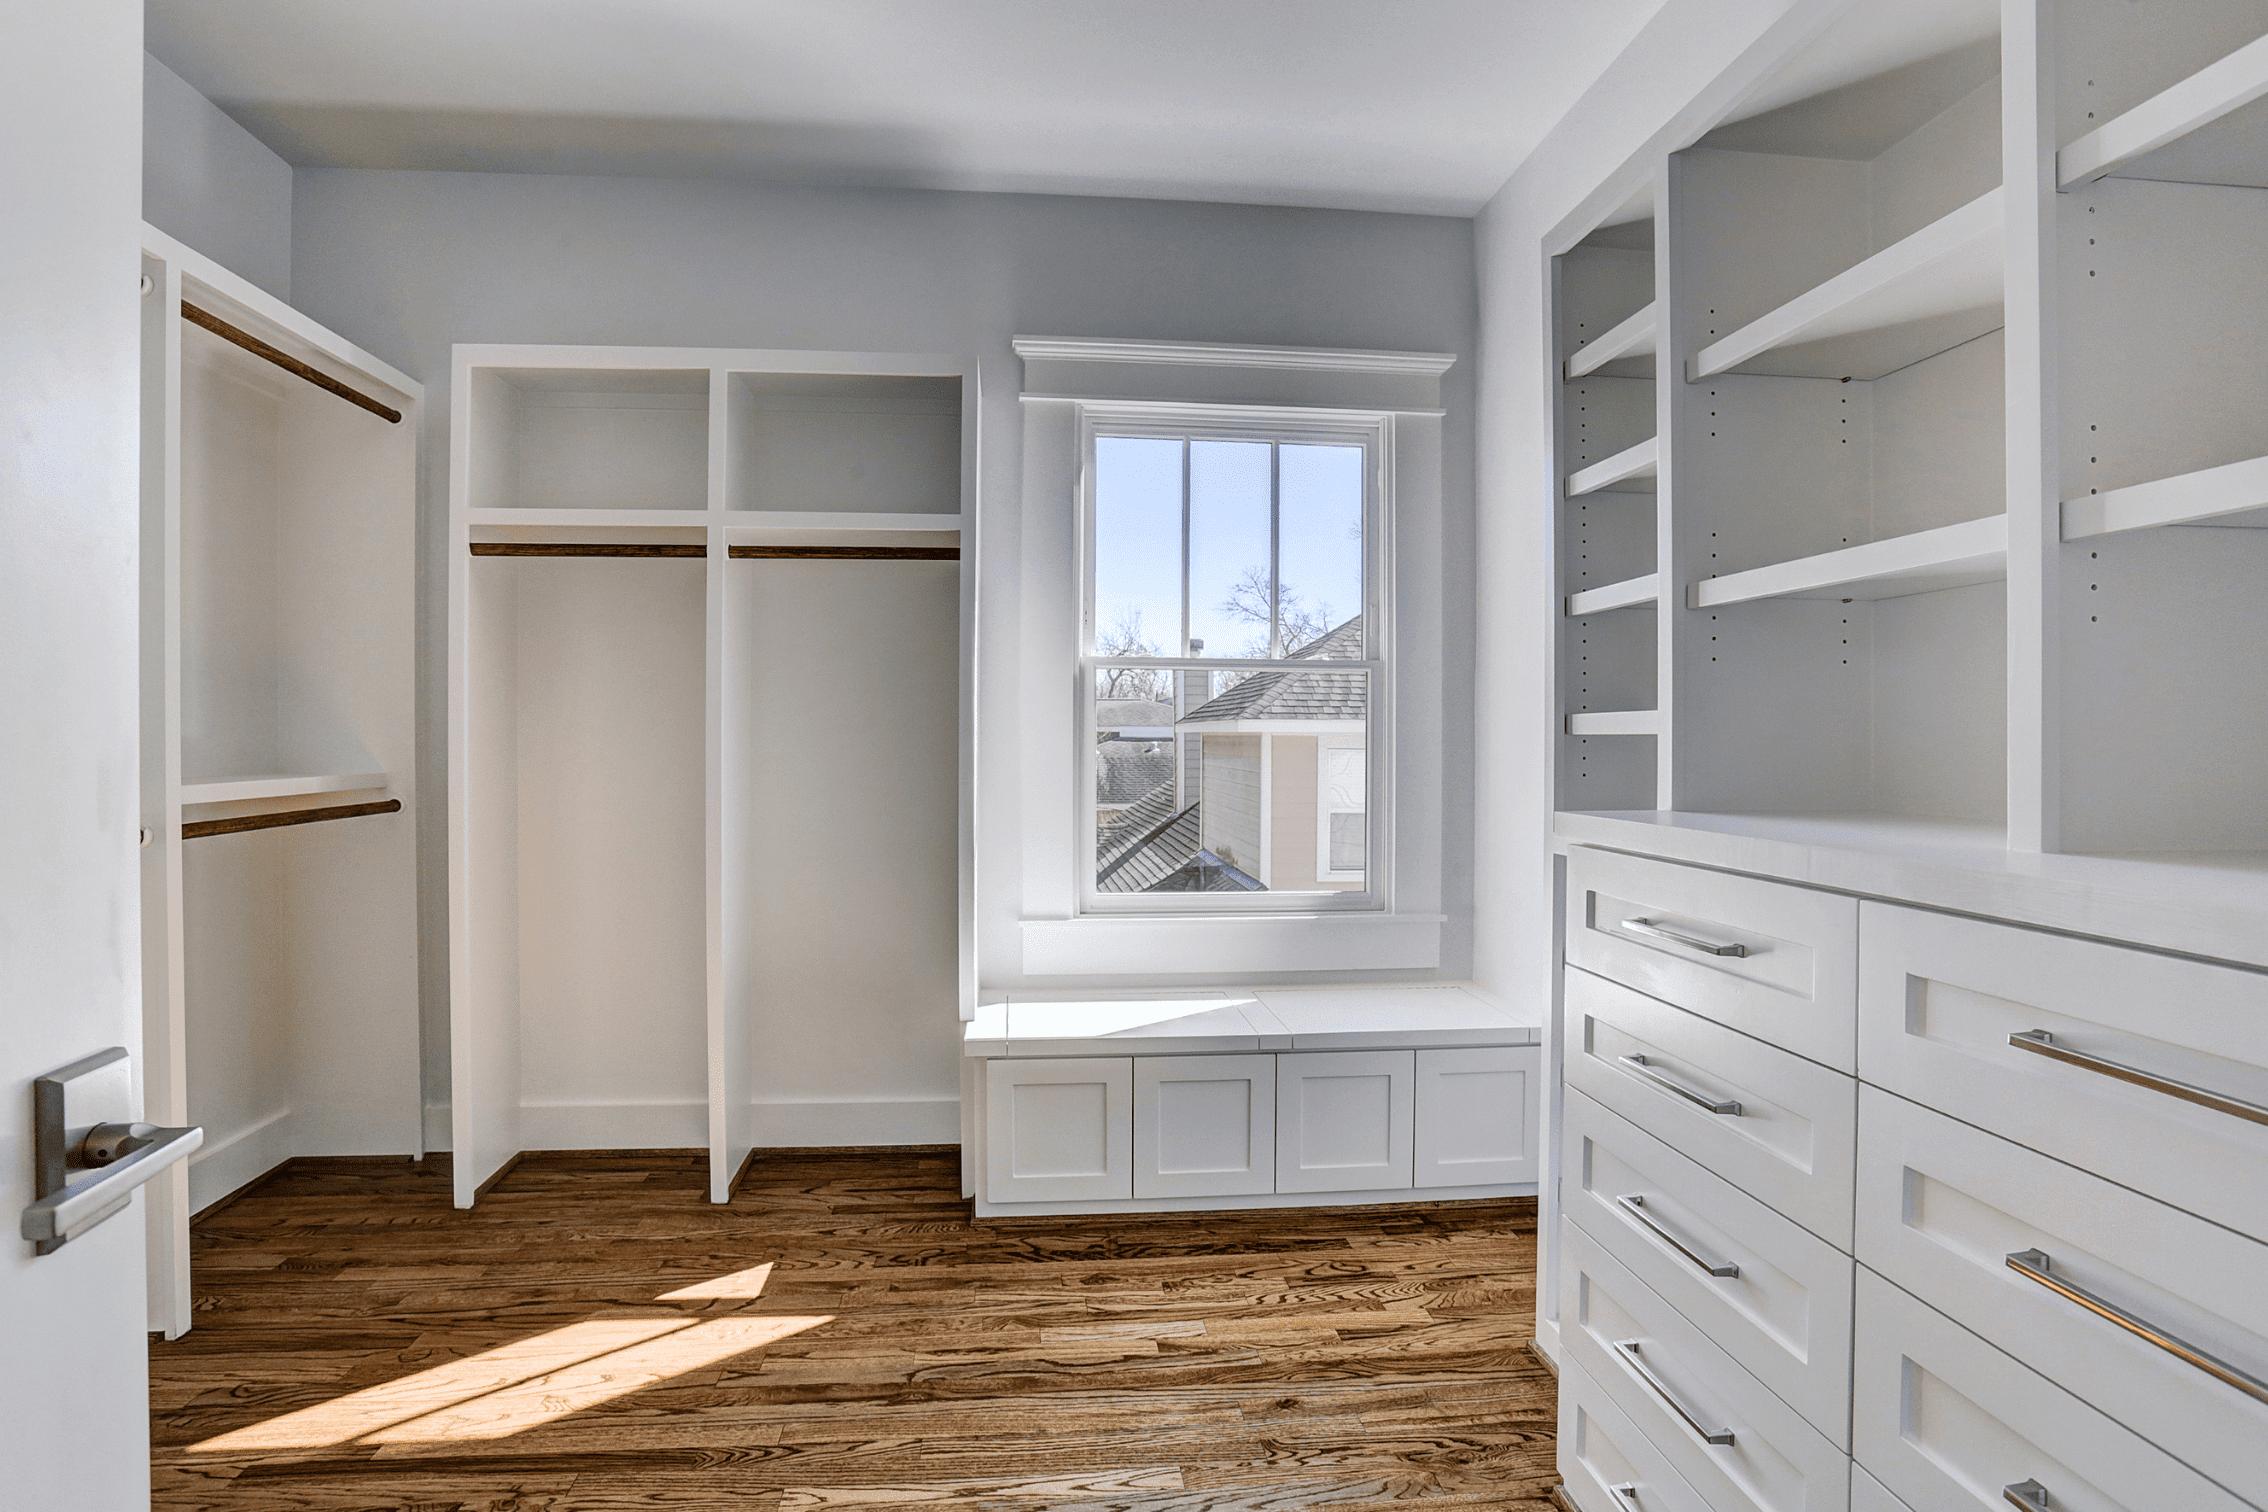 Closet Storage Space in Master Bedroom